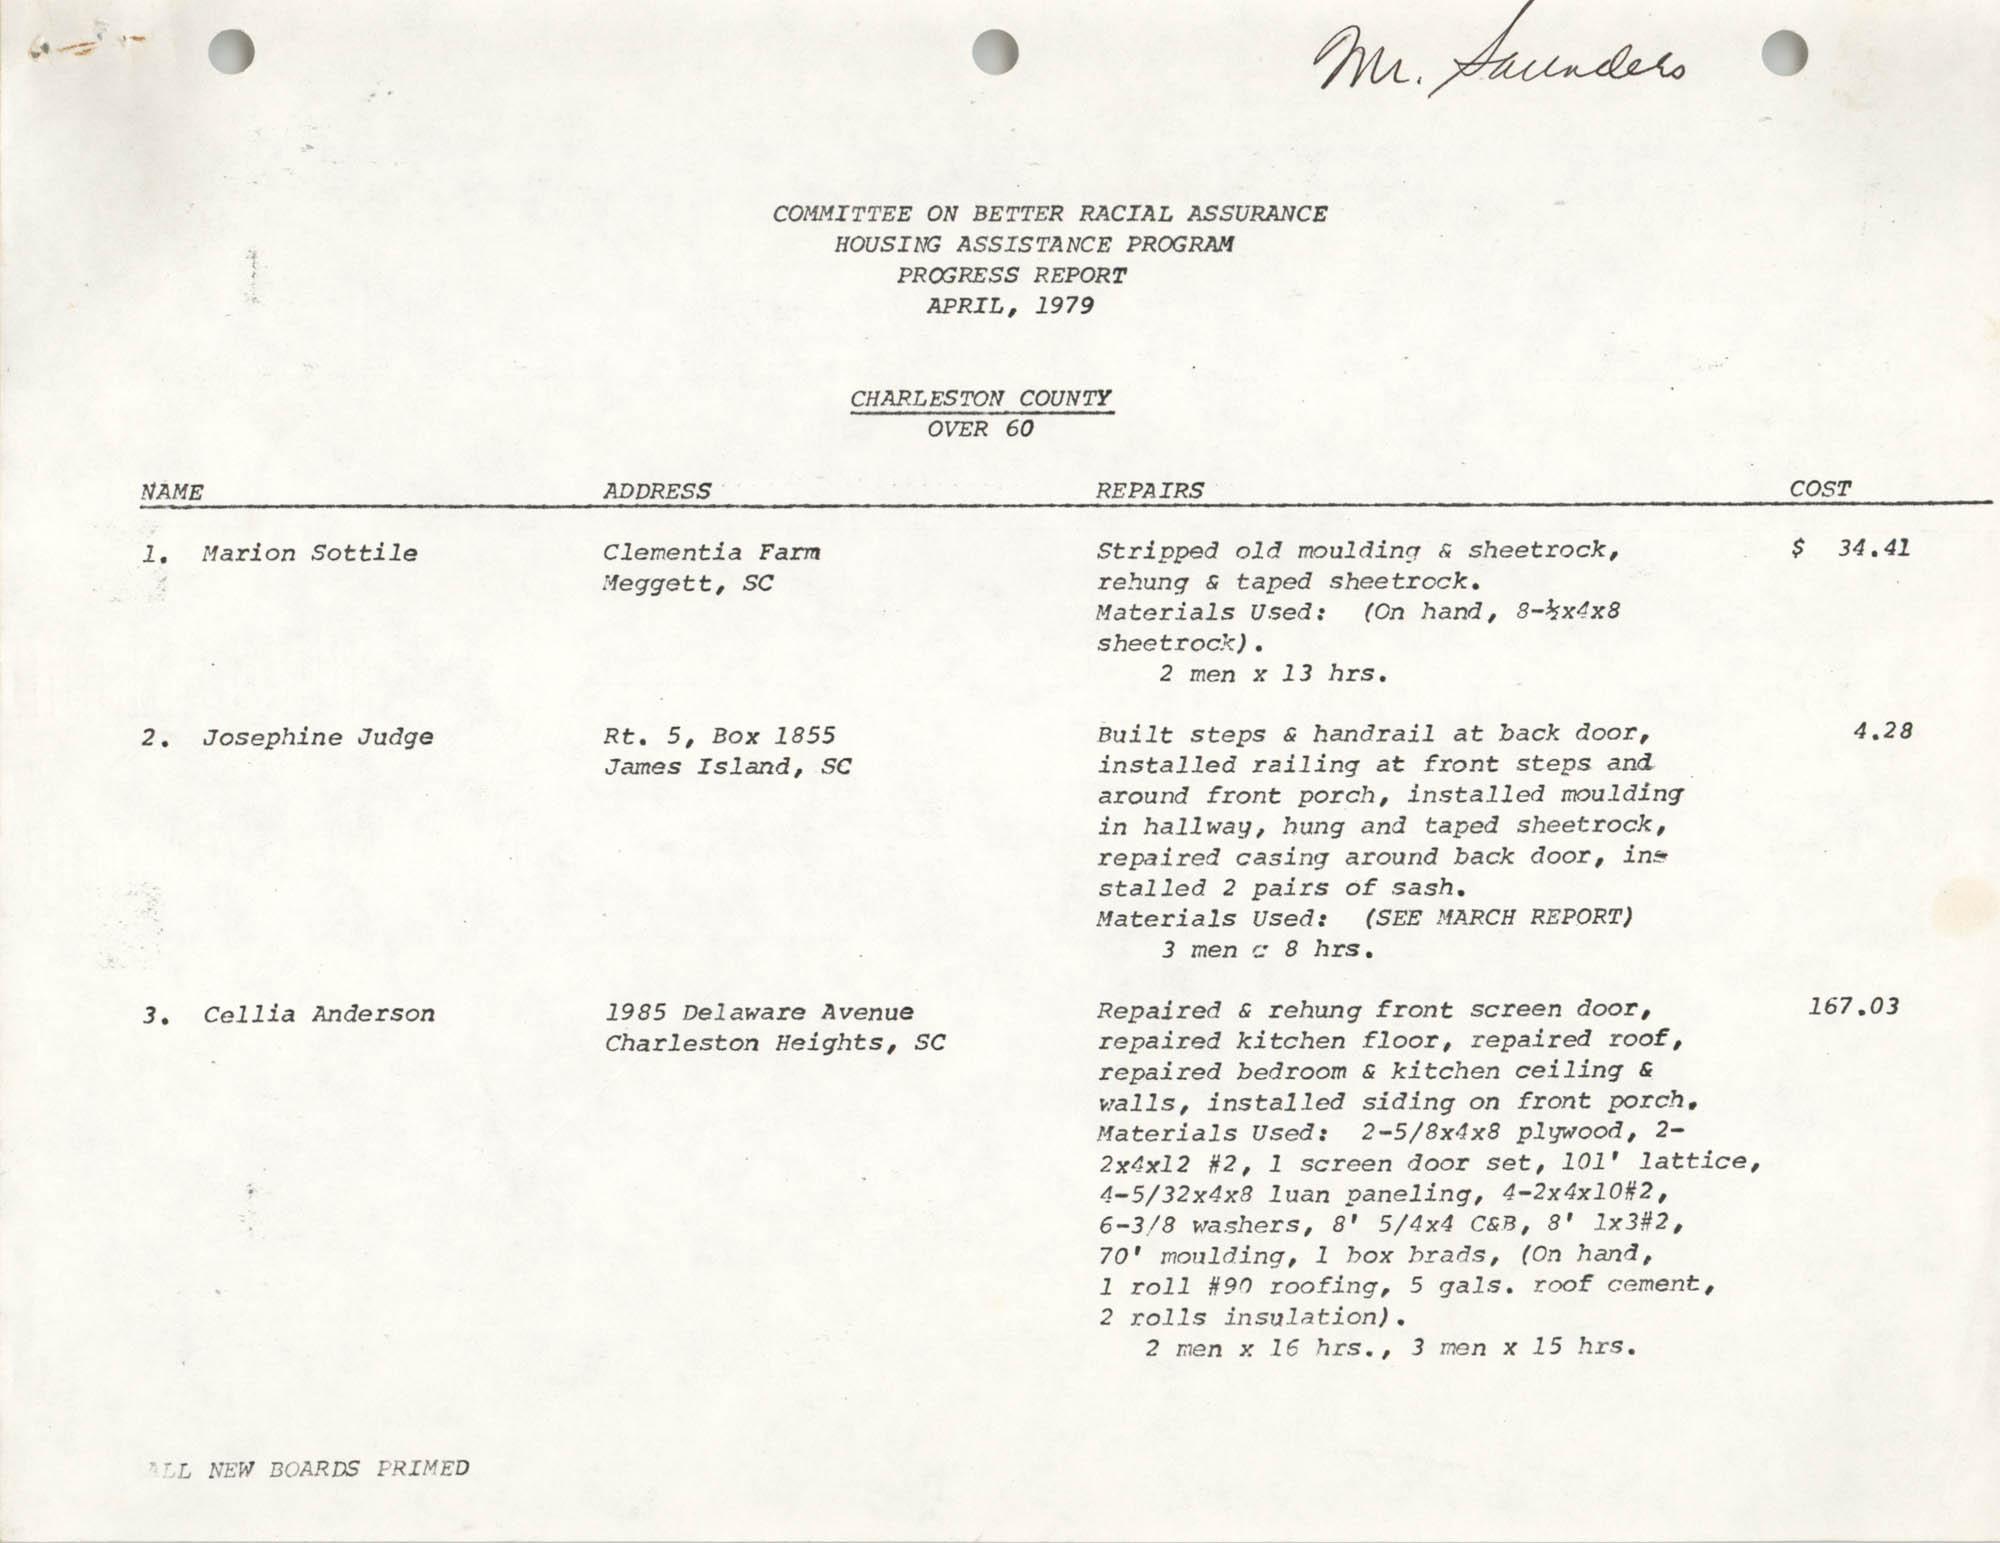 COBRA Housing Assistance Program Progress Report, April 1979